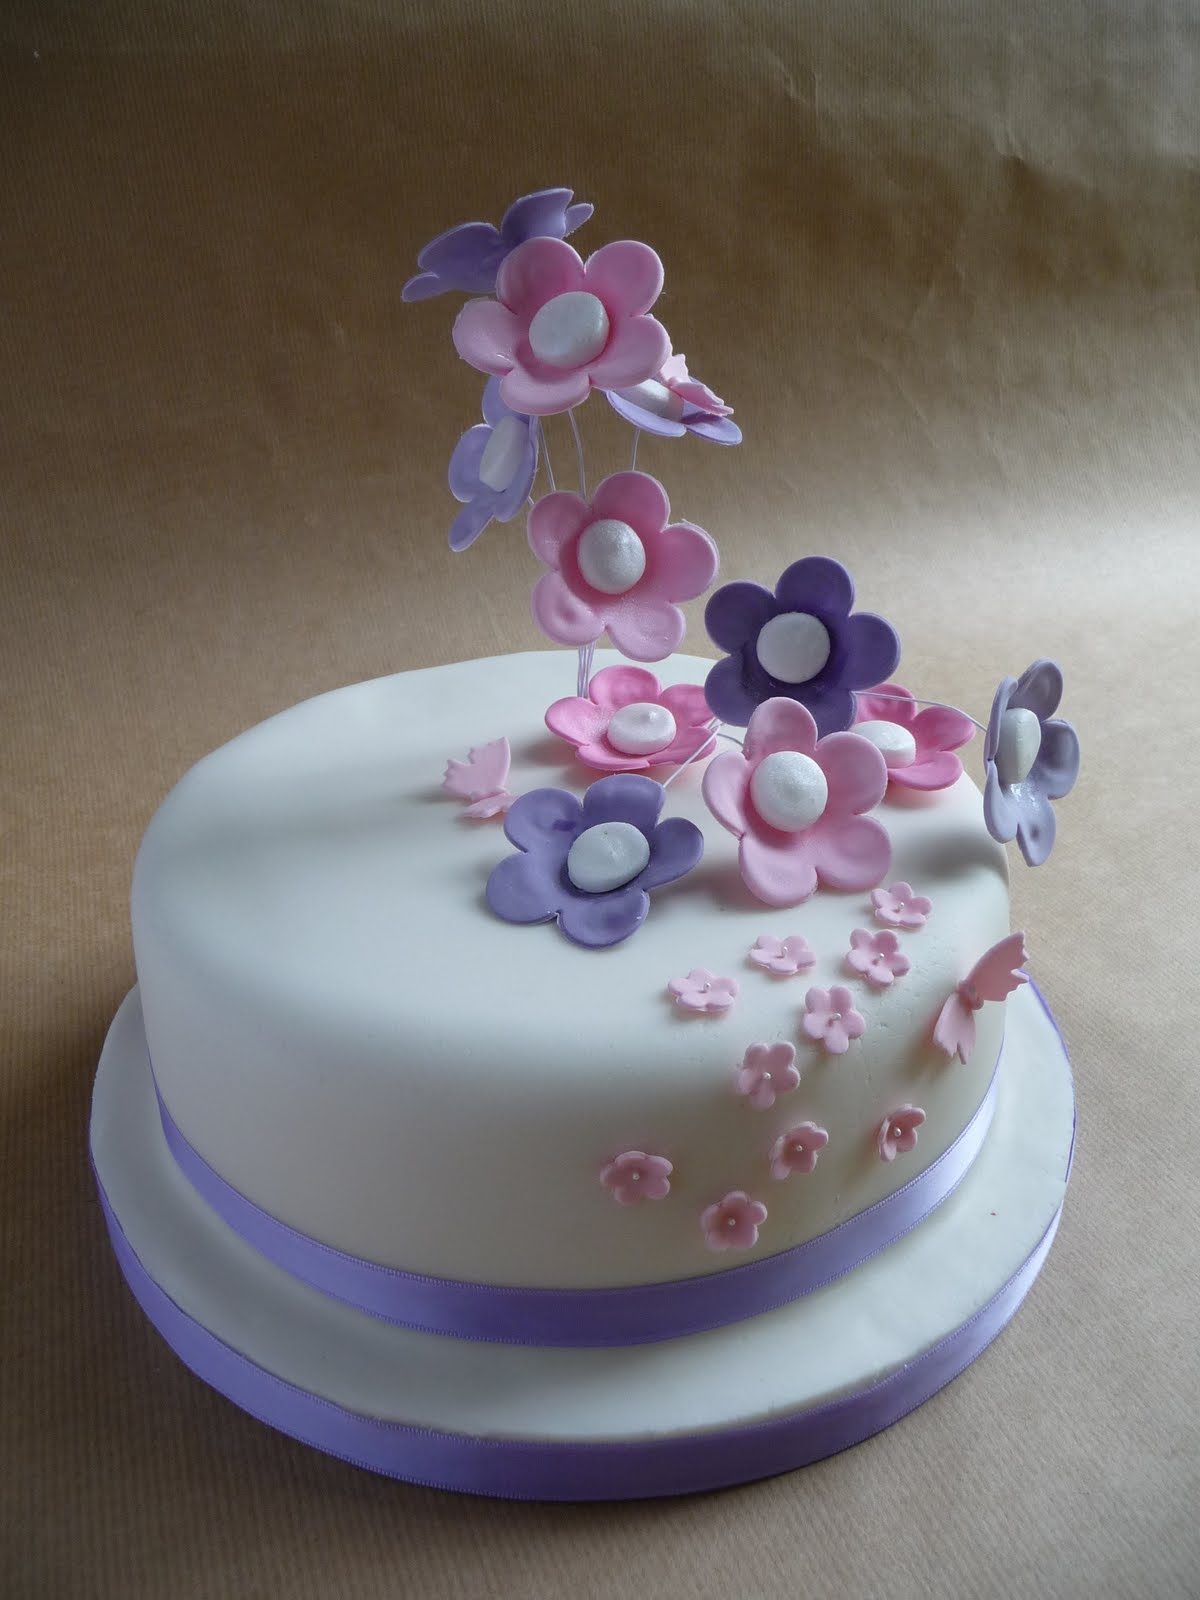 Wedding anniversary flowers buy a cake